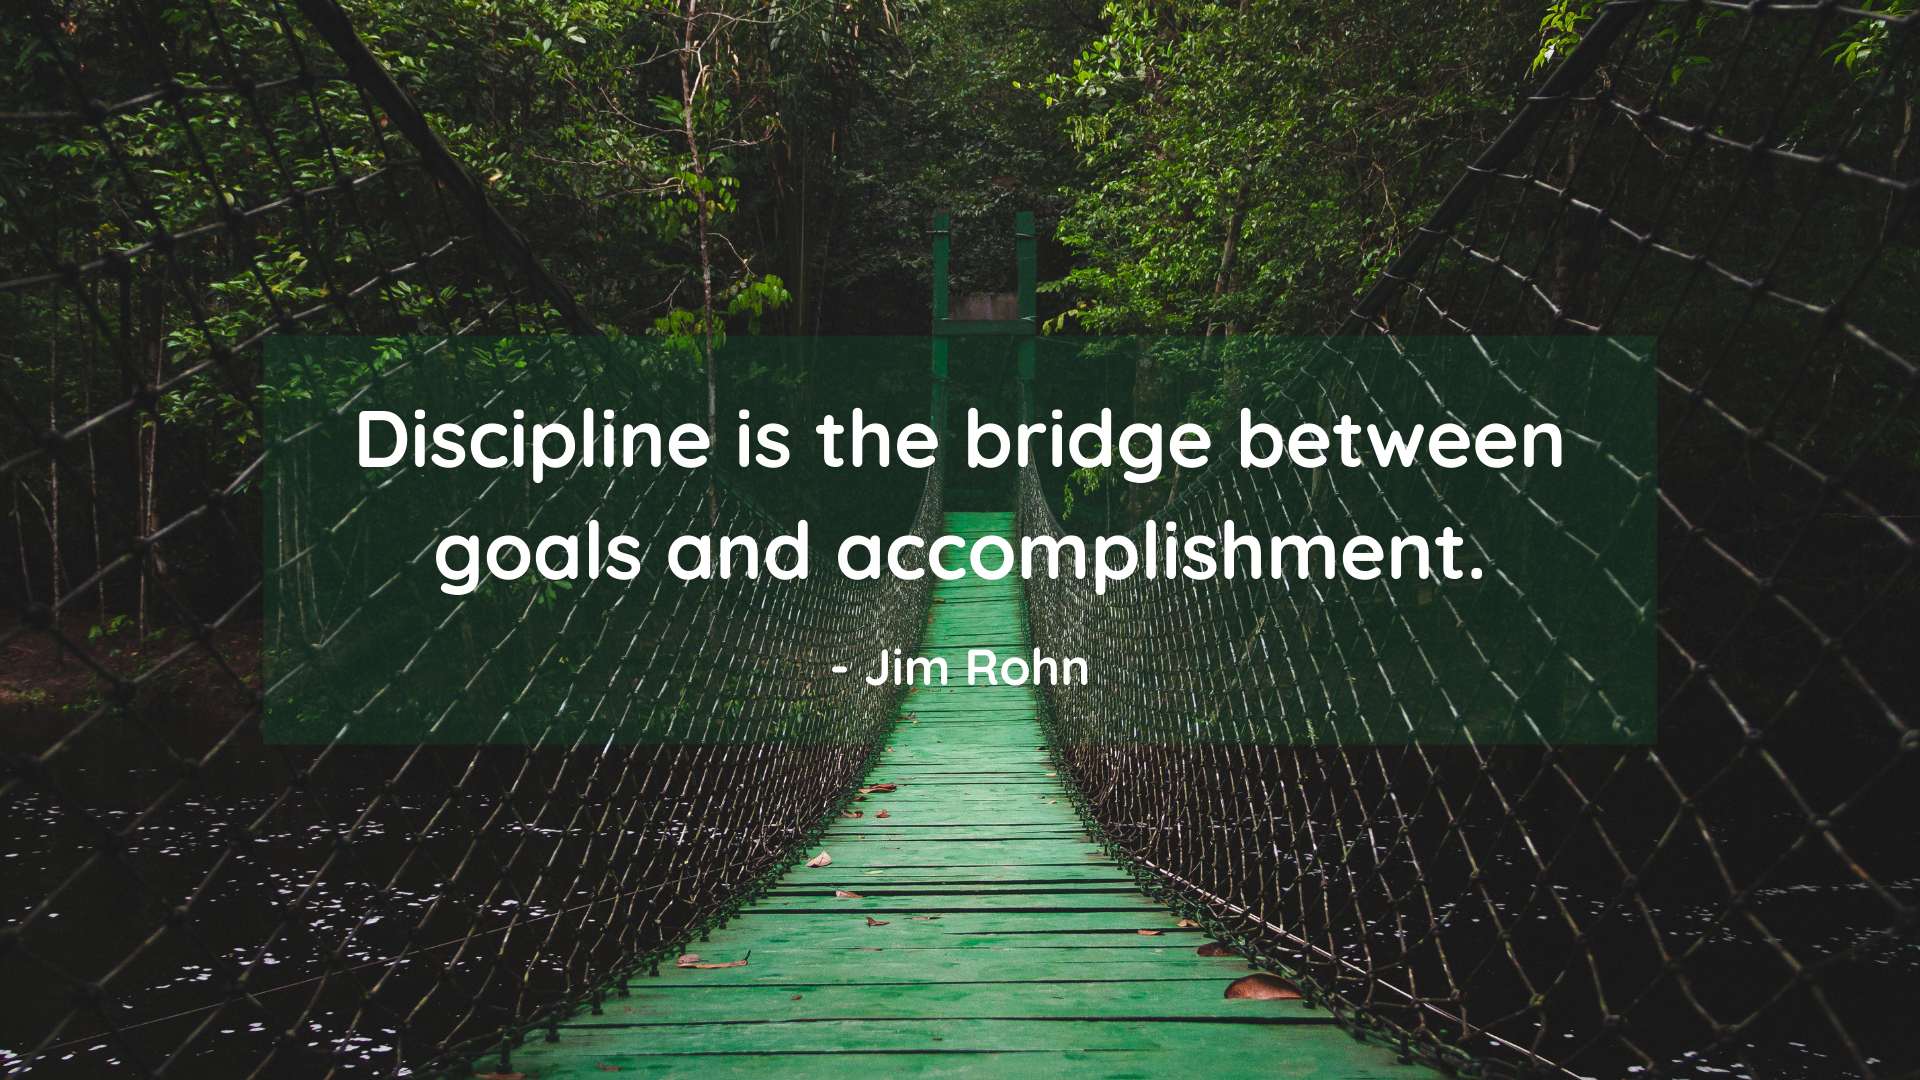 Discipline is the bridge between goals and accomplishment. – Jim Rohn[1920×1080]